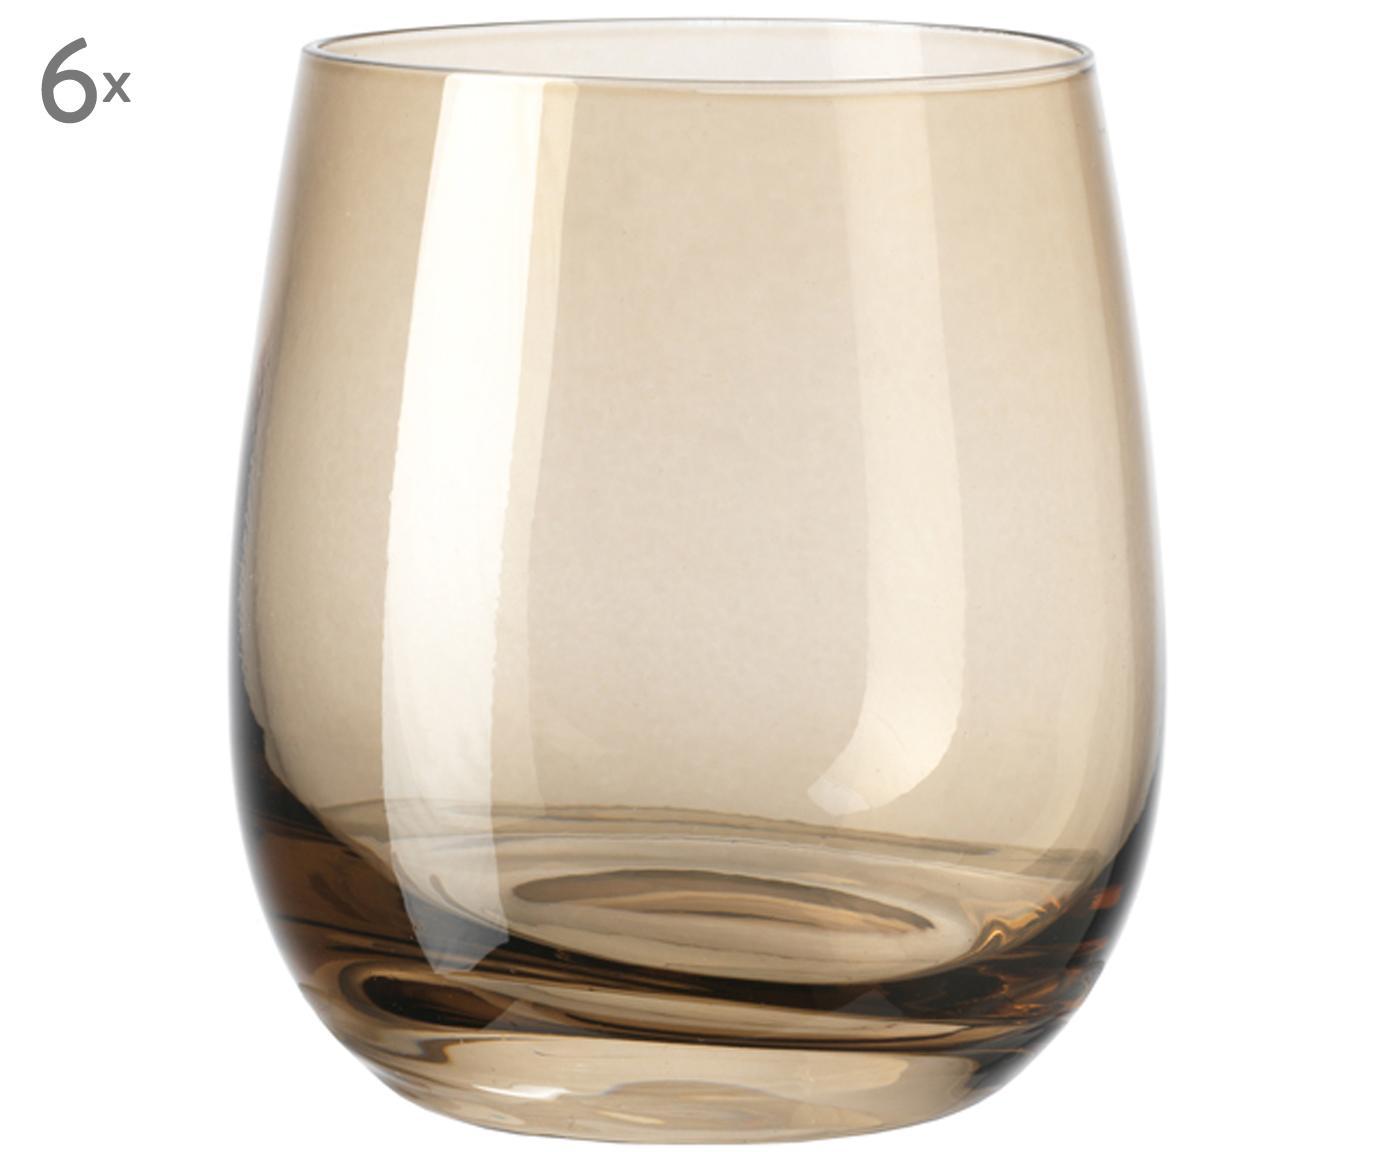 Vasos de alta calidad Sora, 6uds., Vidrio, Beige, Ø 8 x Al 10 cm